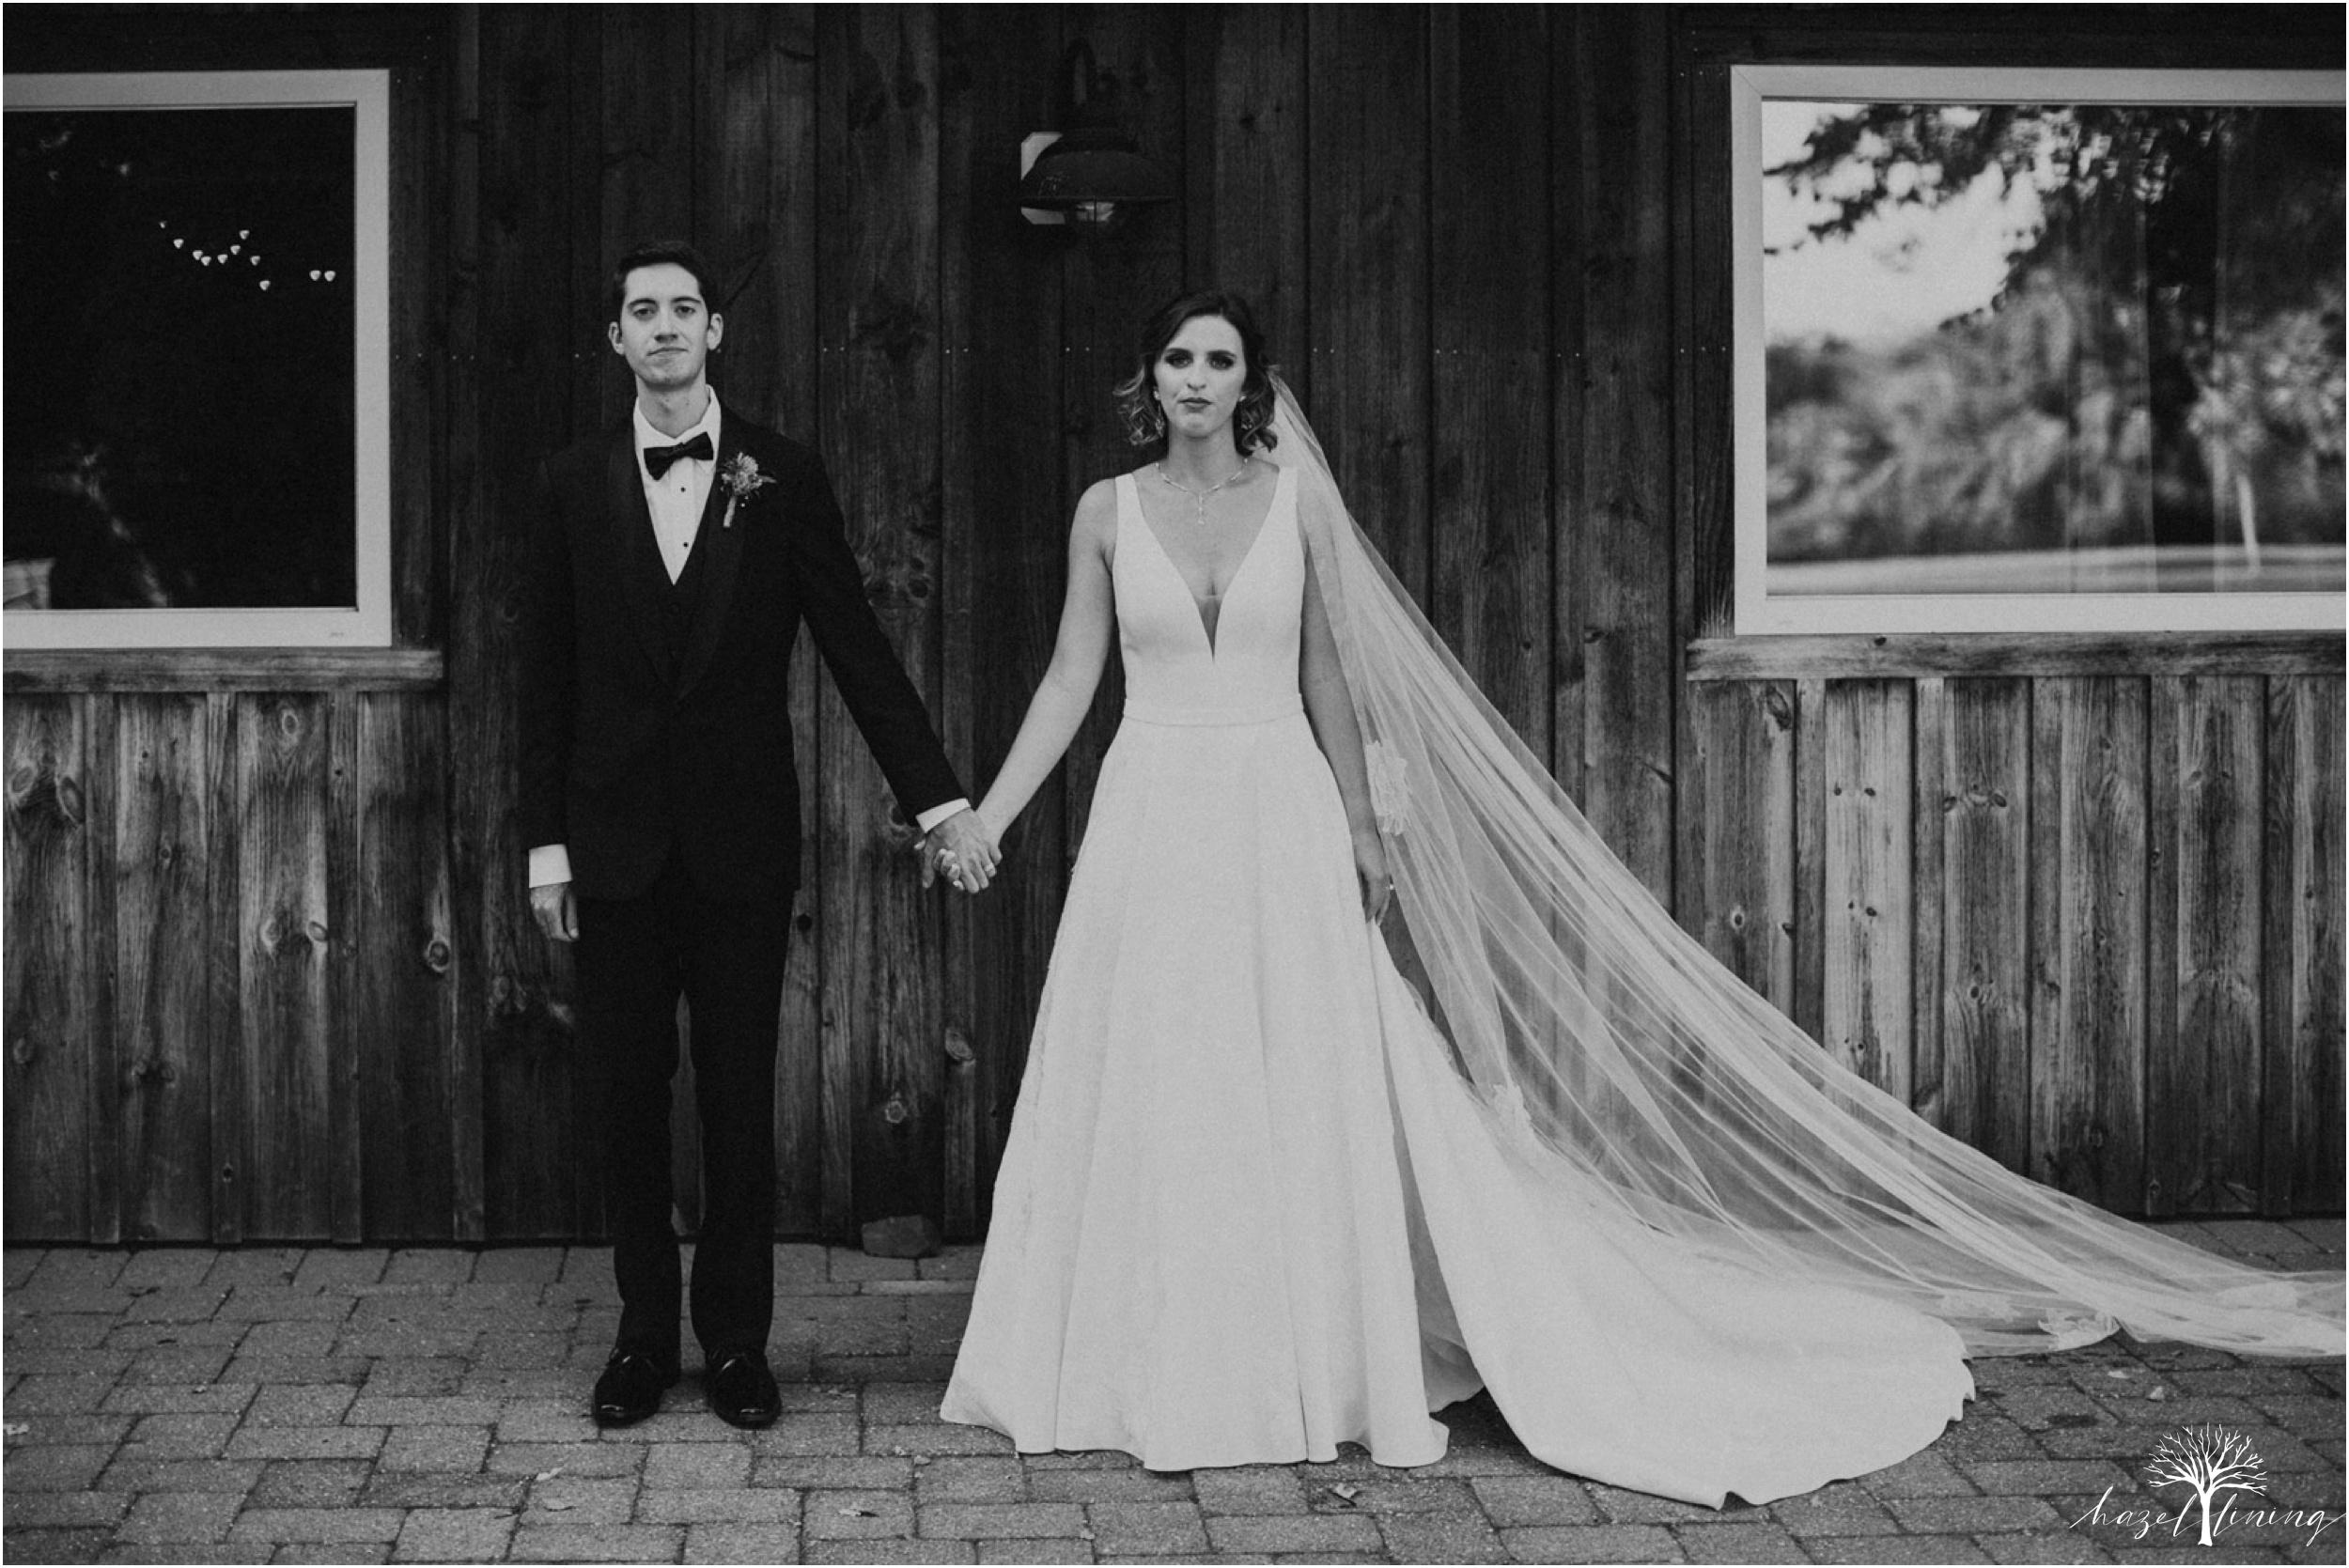 maureen-hepner-anthony-giordano-rose-bank-winery-newtow-pennsylvania-luxury-summer-wedding-hazel-lining-photography-destination-elopement-wedding-engagement-photography_0109.jpg